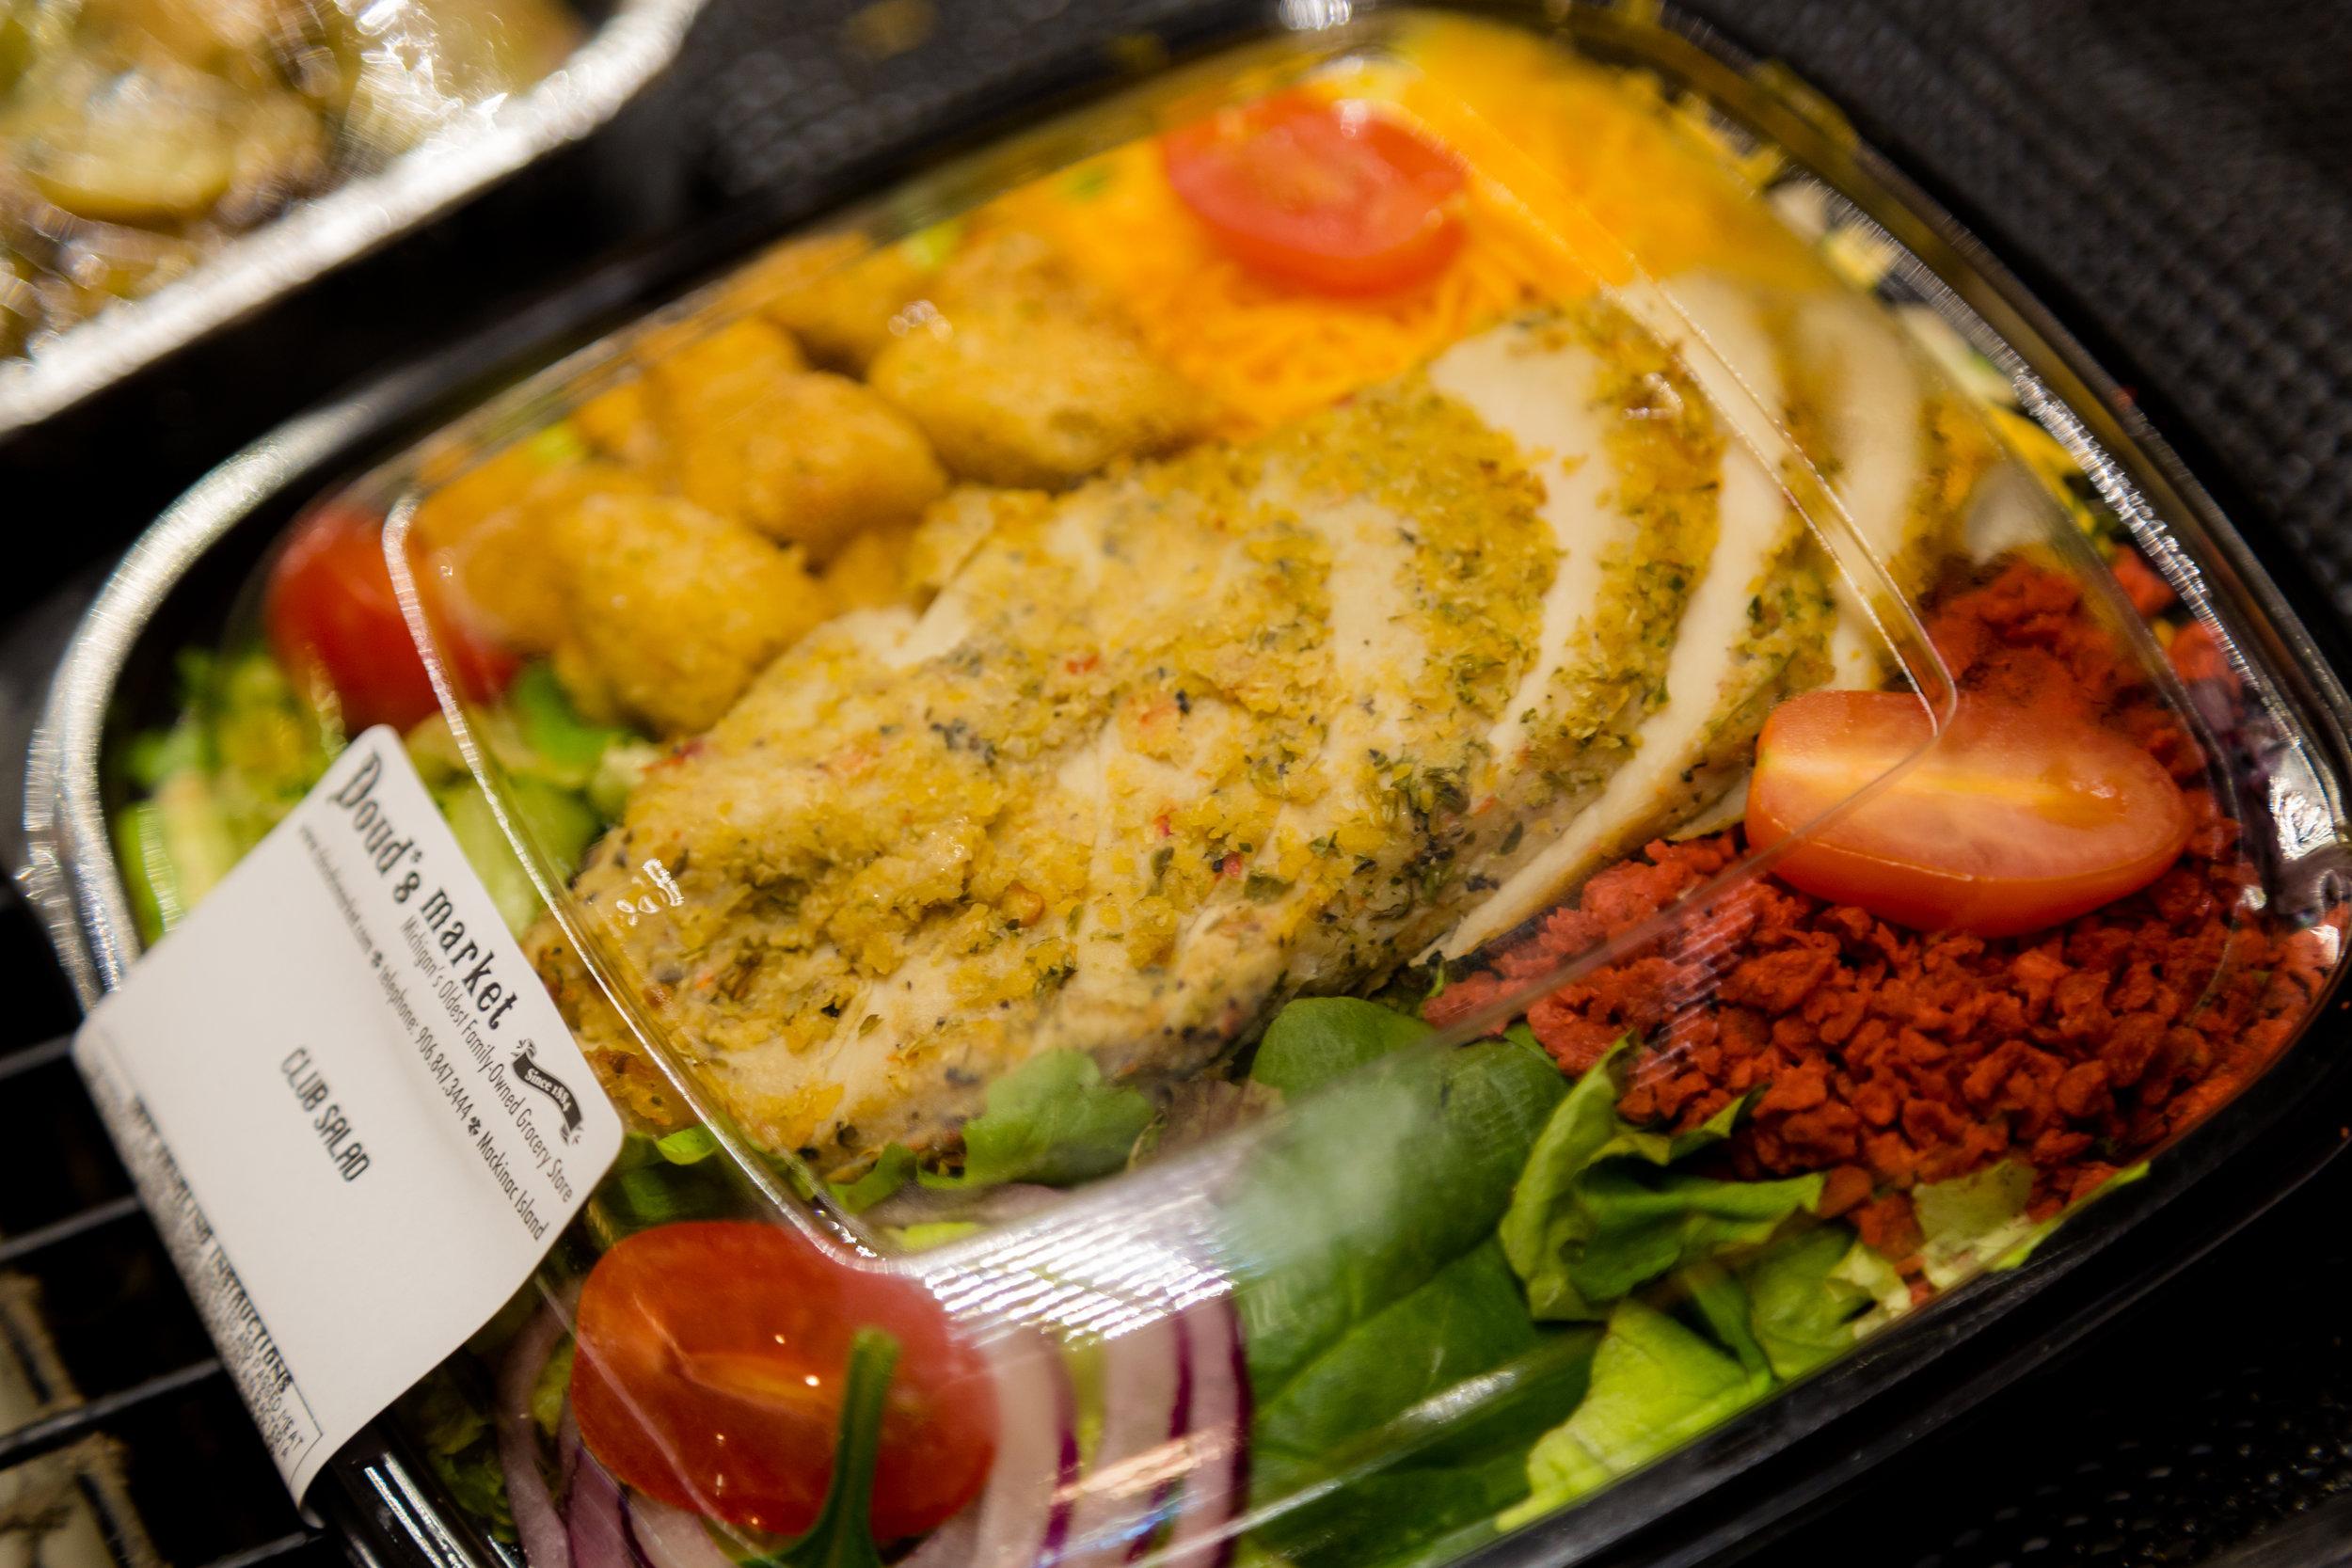 Food to go, lunch, snacks, salad, deli, club salad, fresh made